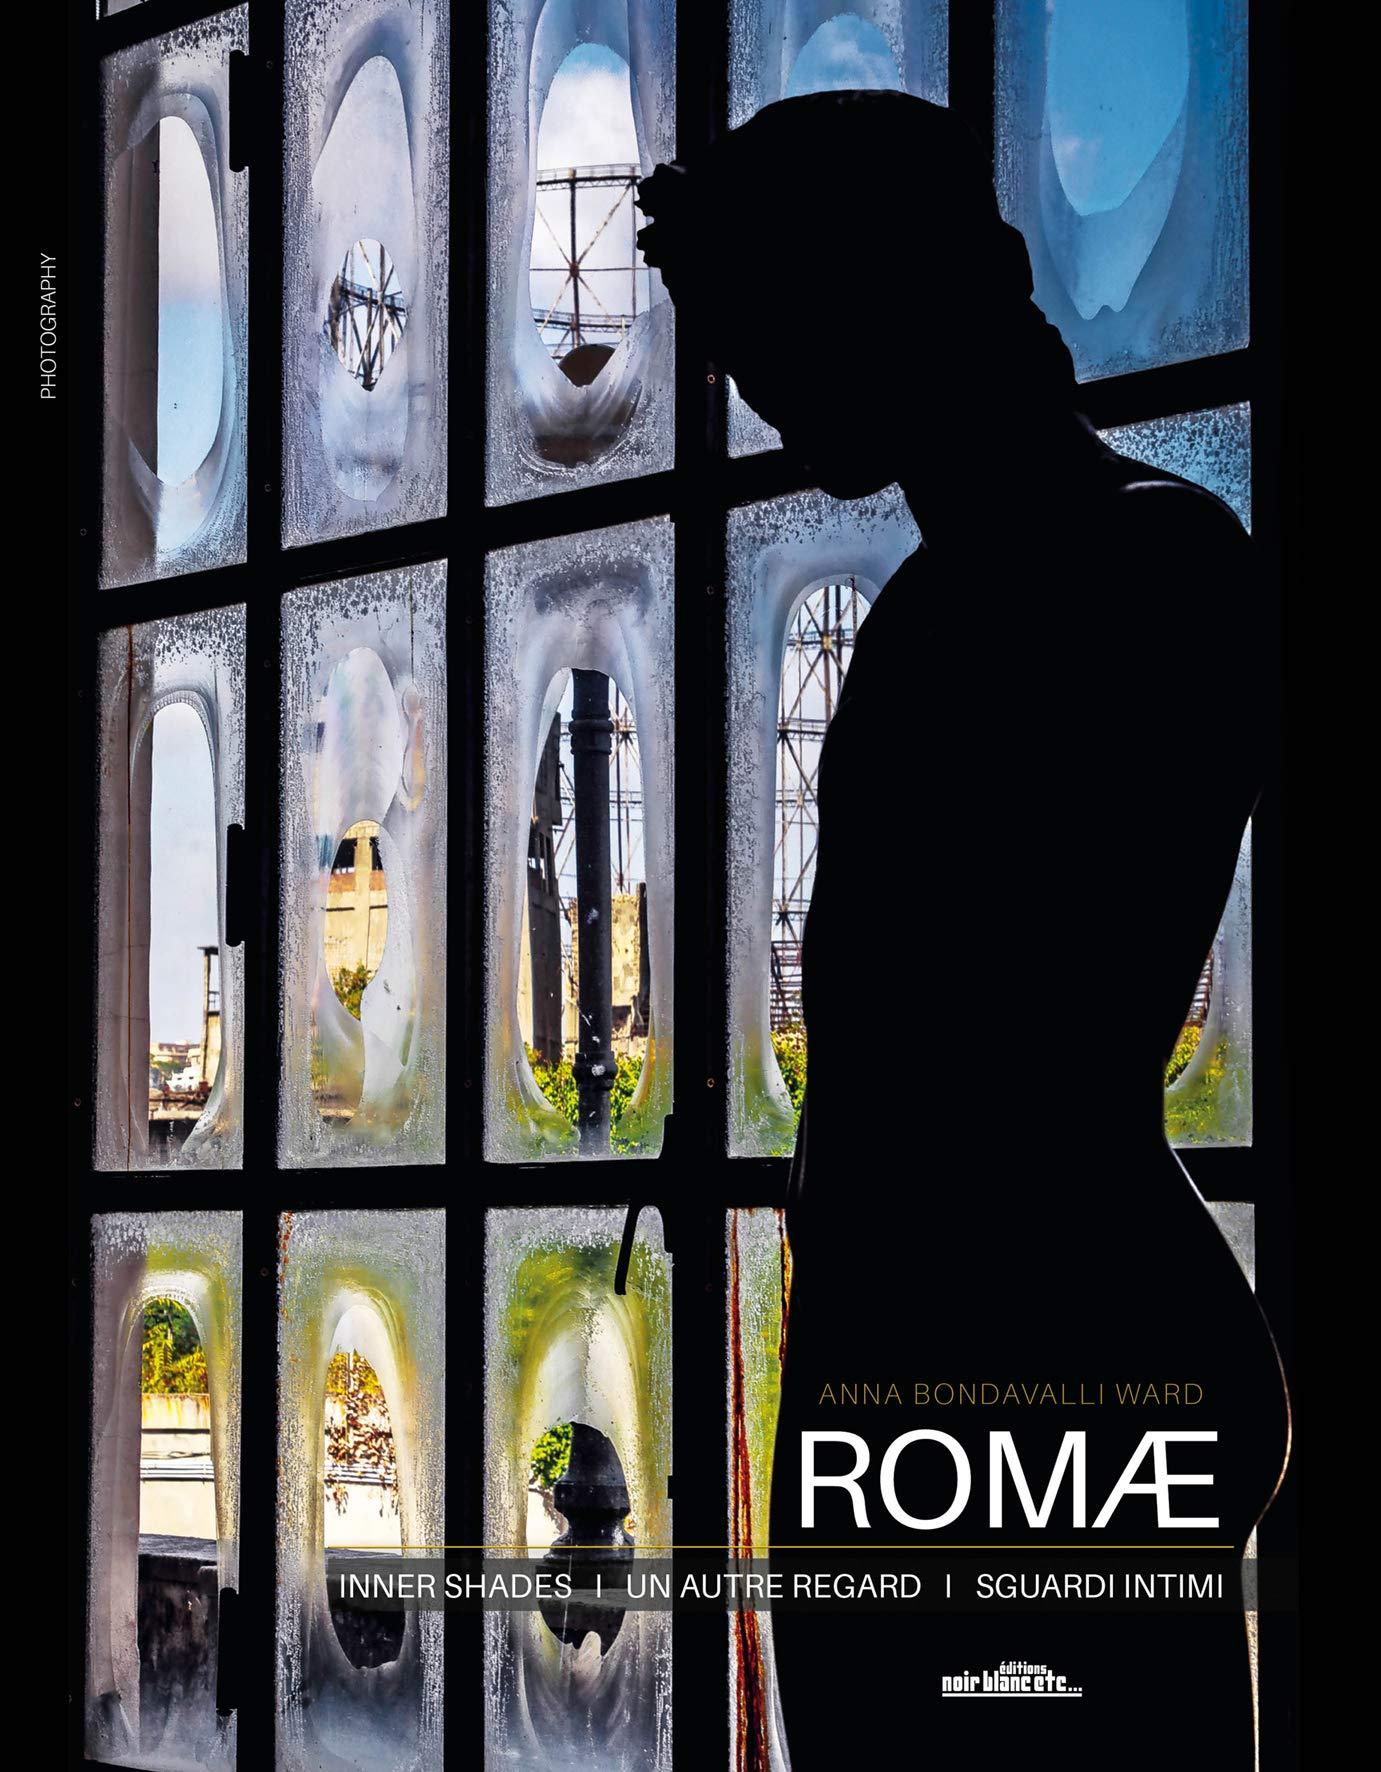 ROMAE